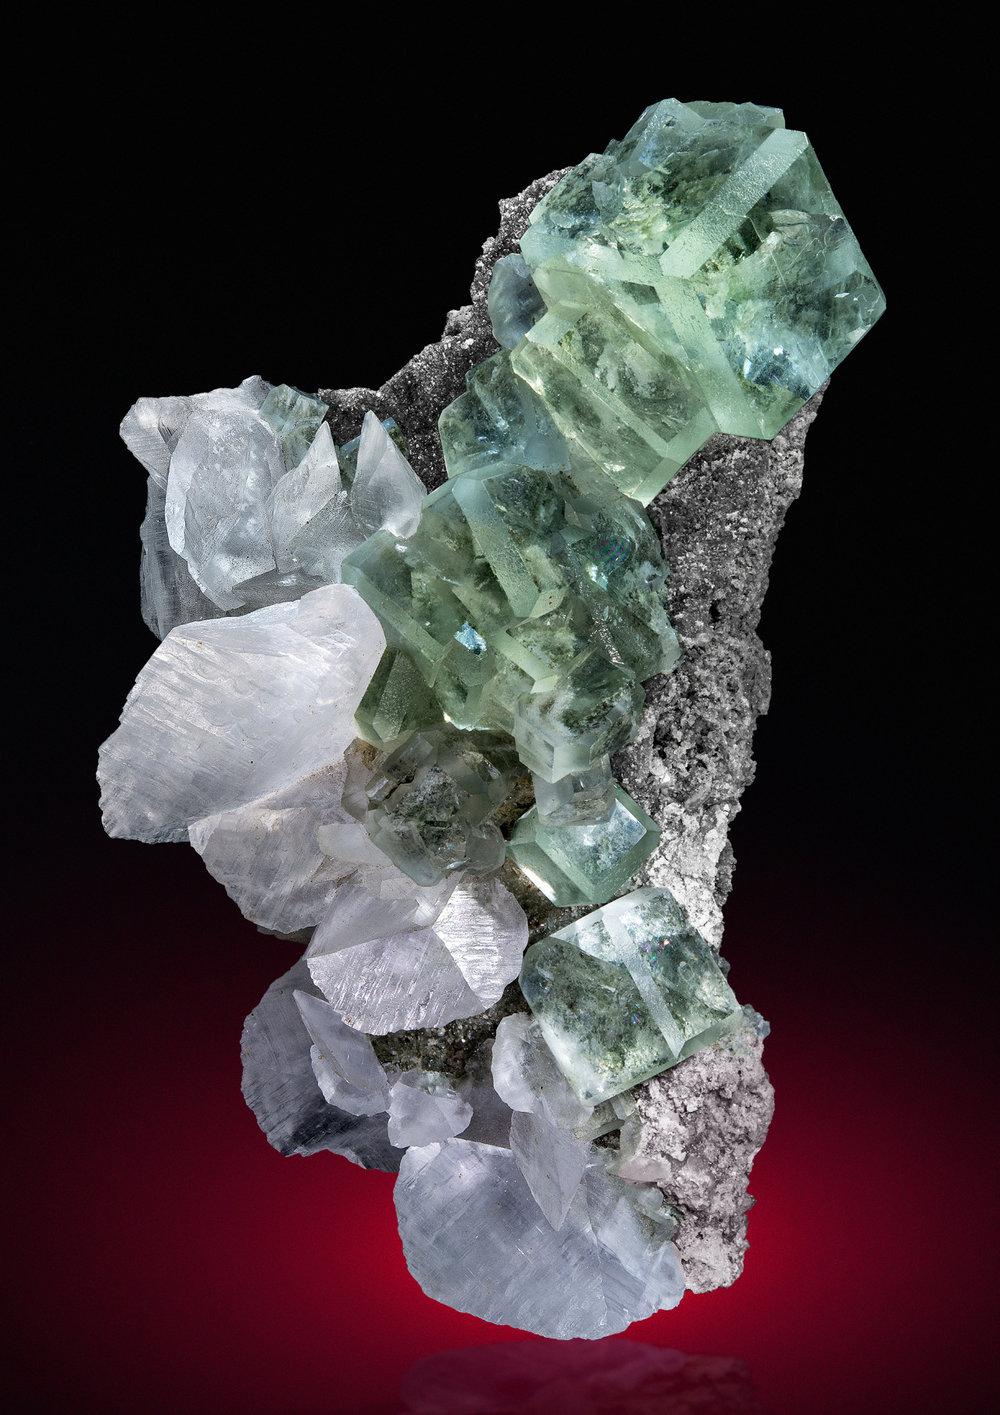 bijoux-et-mineraux: Fluorite with Calcite - Chenzhou Prefecture, Hunan, China